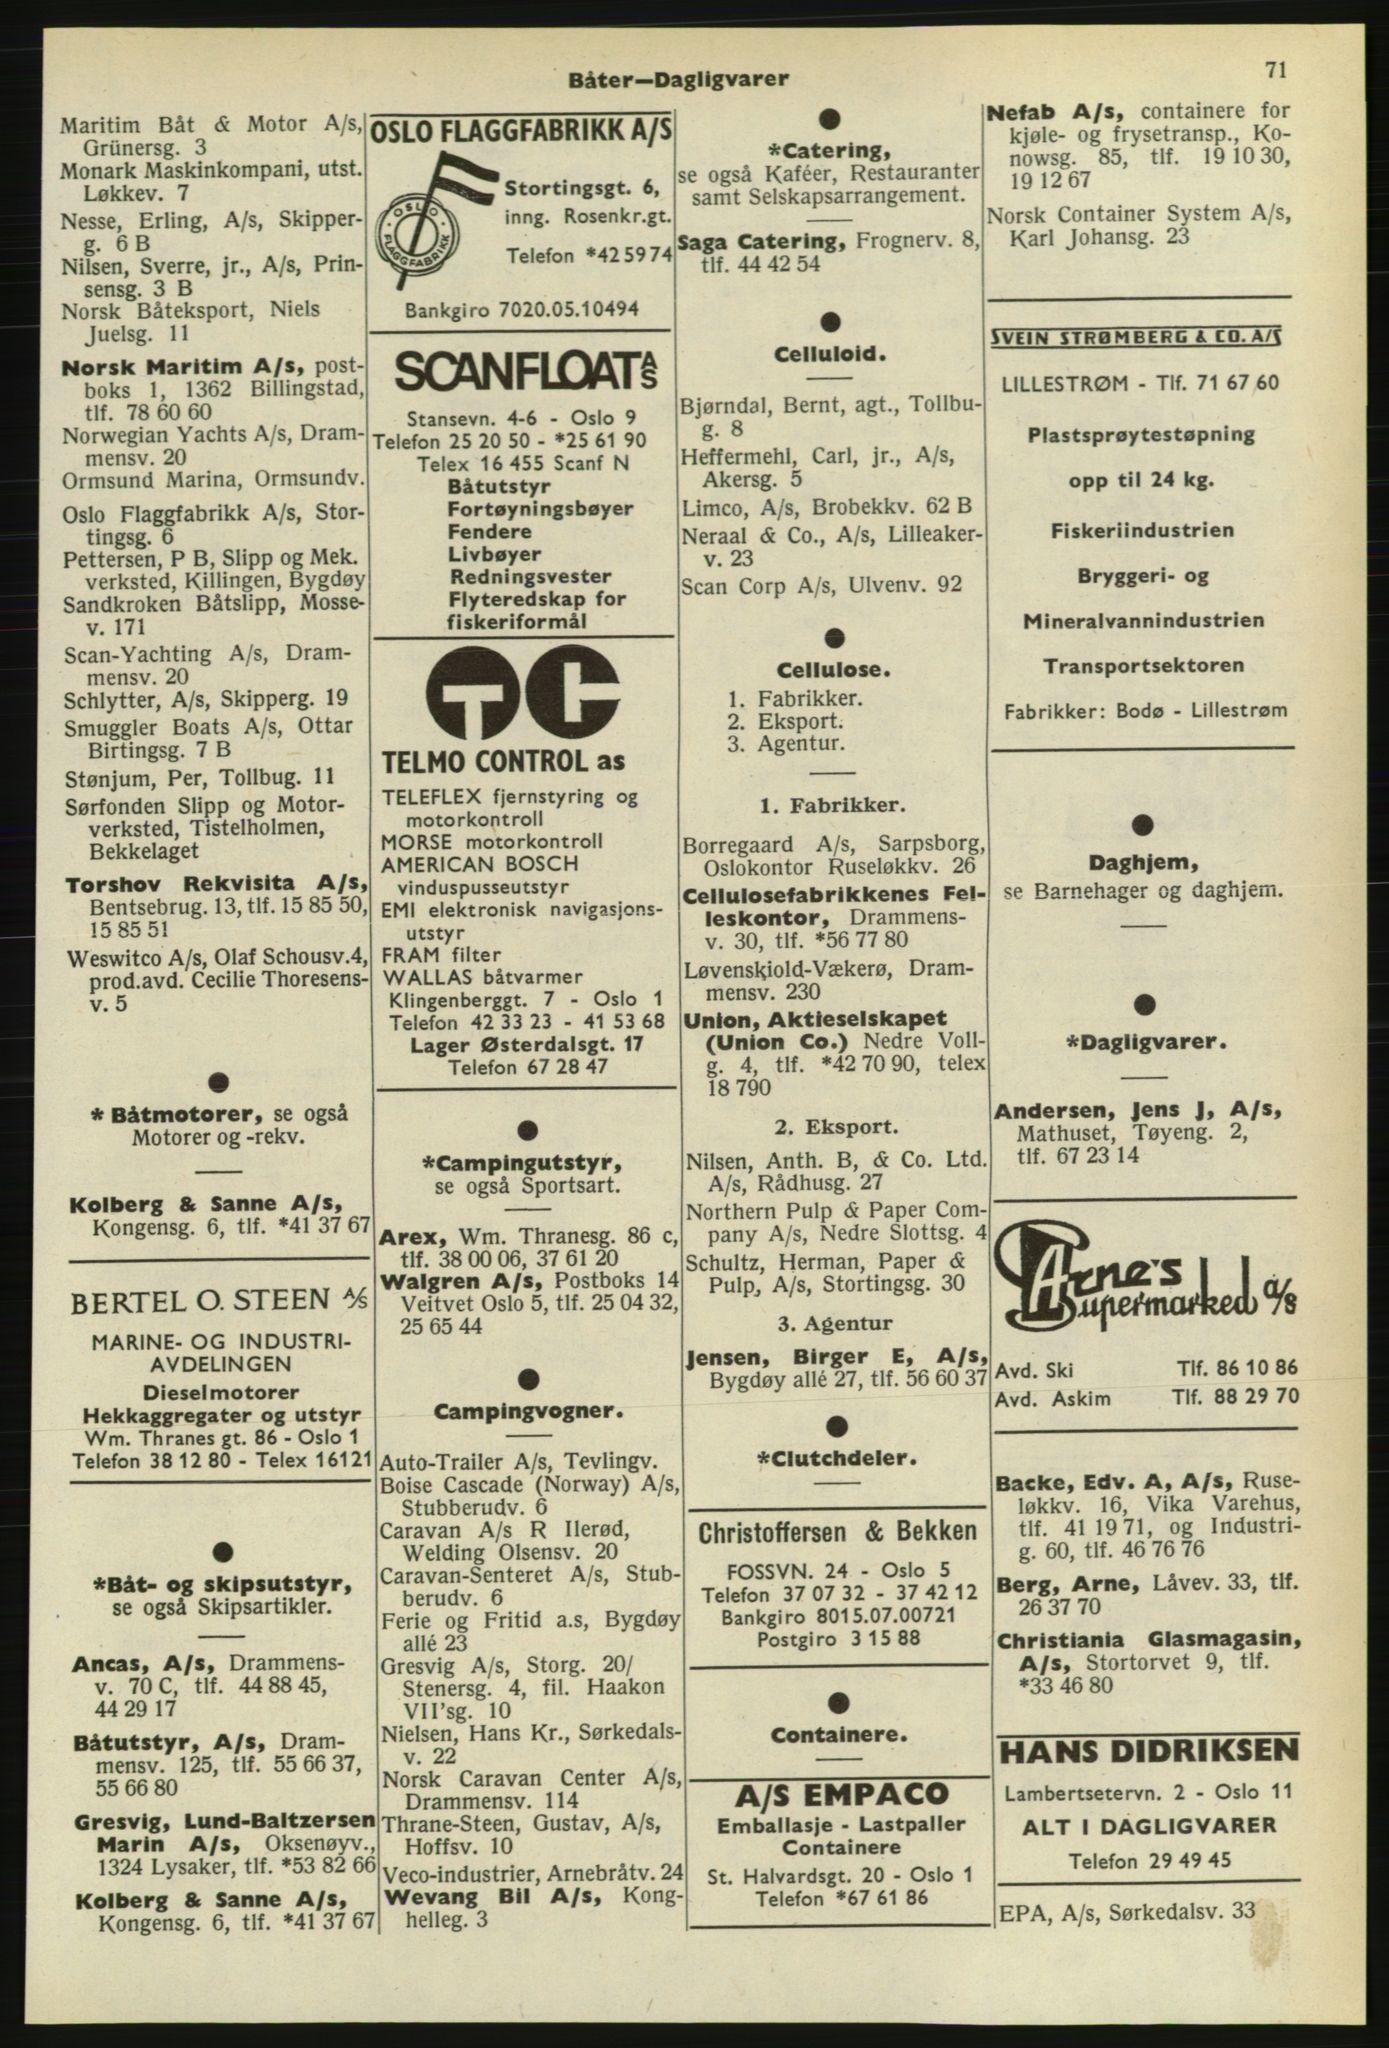 PUBL, Kristiania/Oslo adressebok, 1974-1975, s. 71